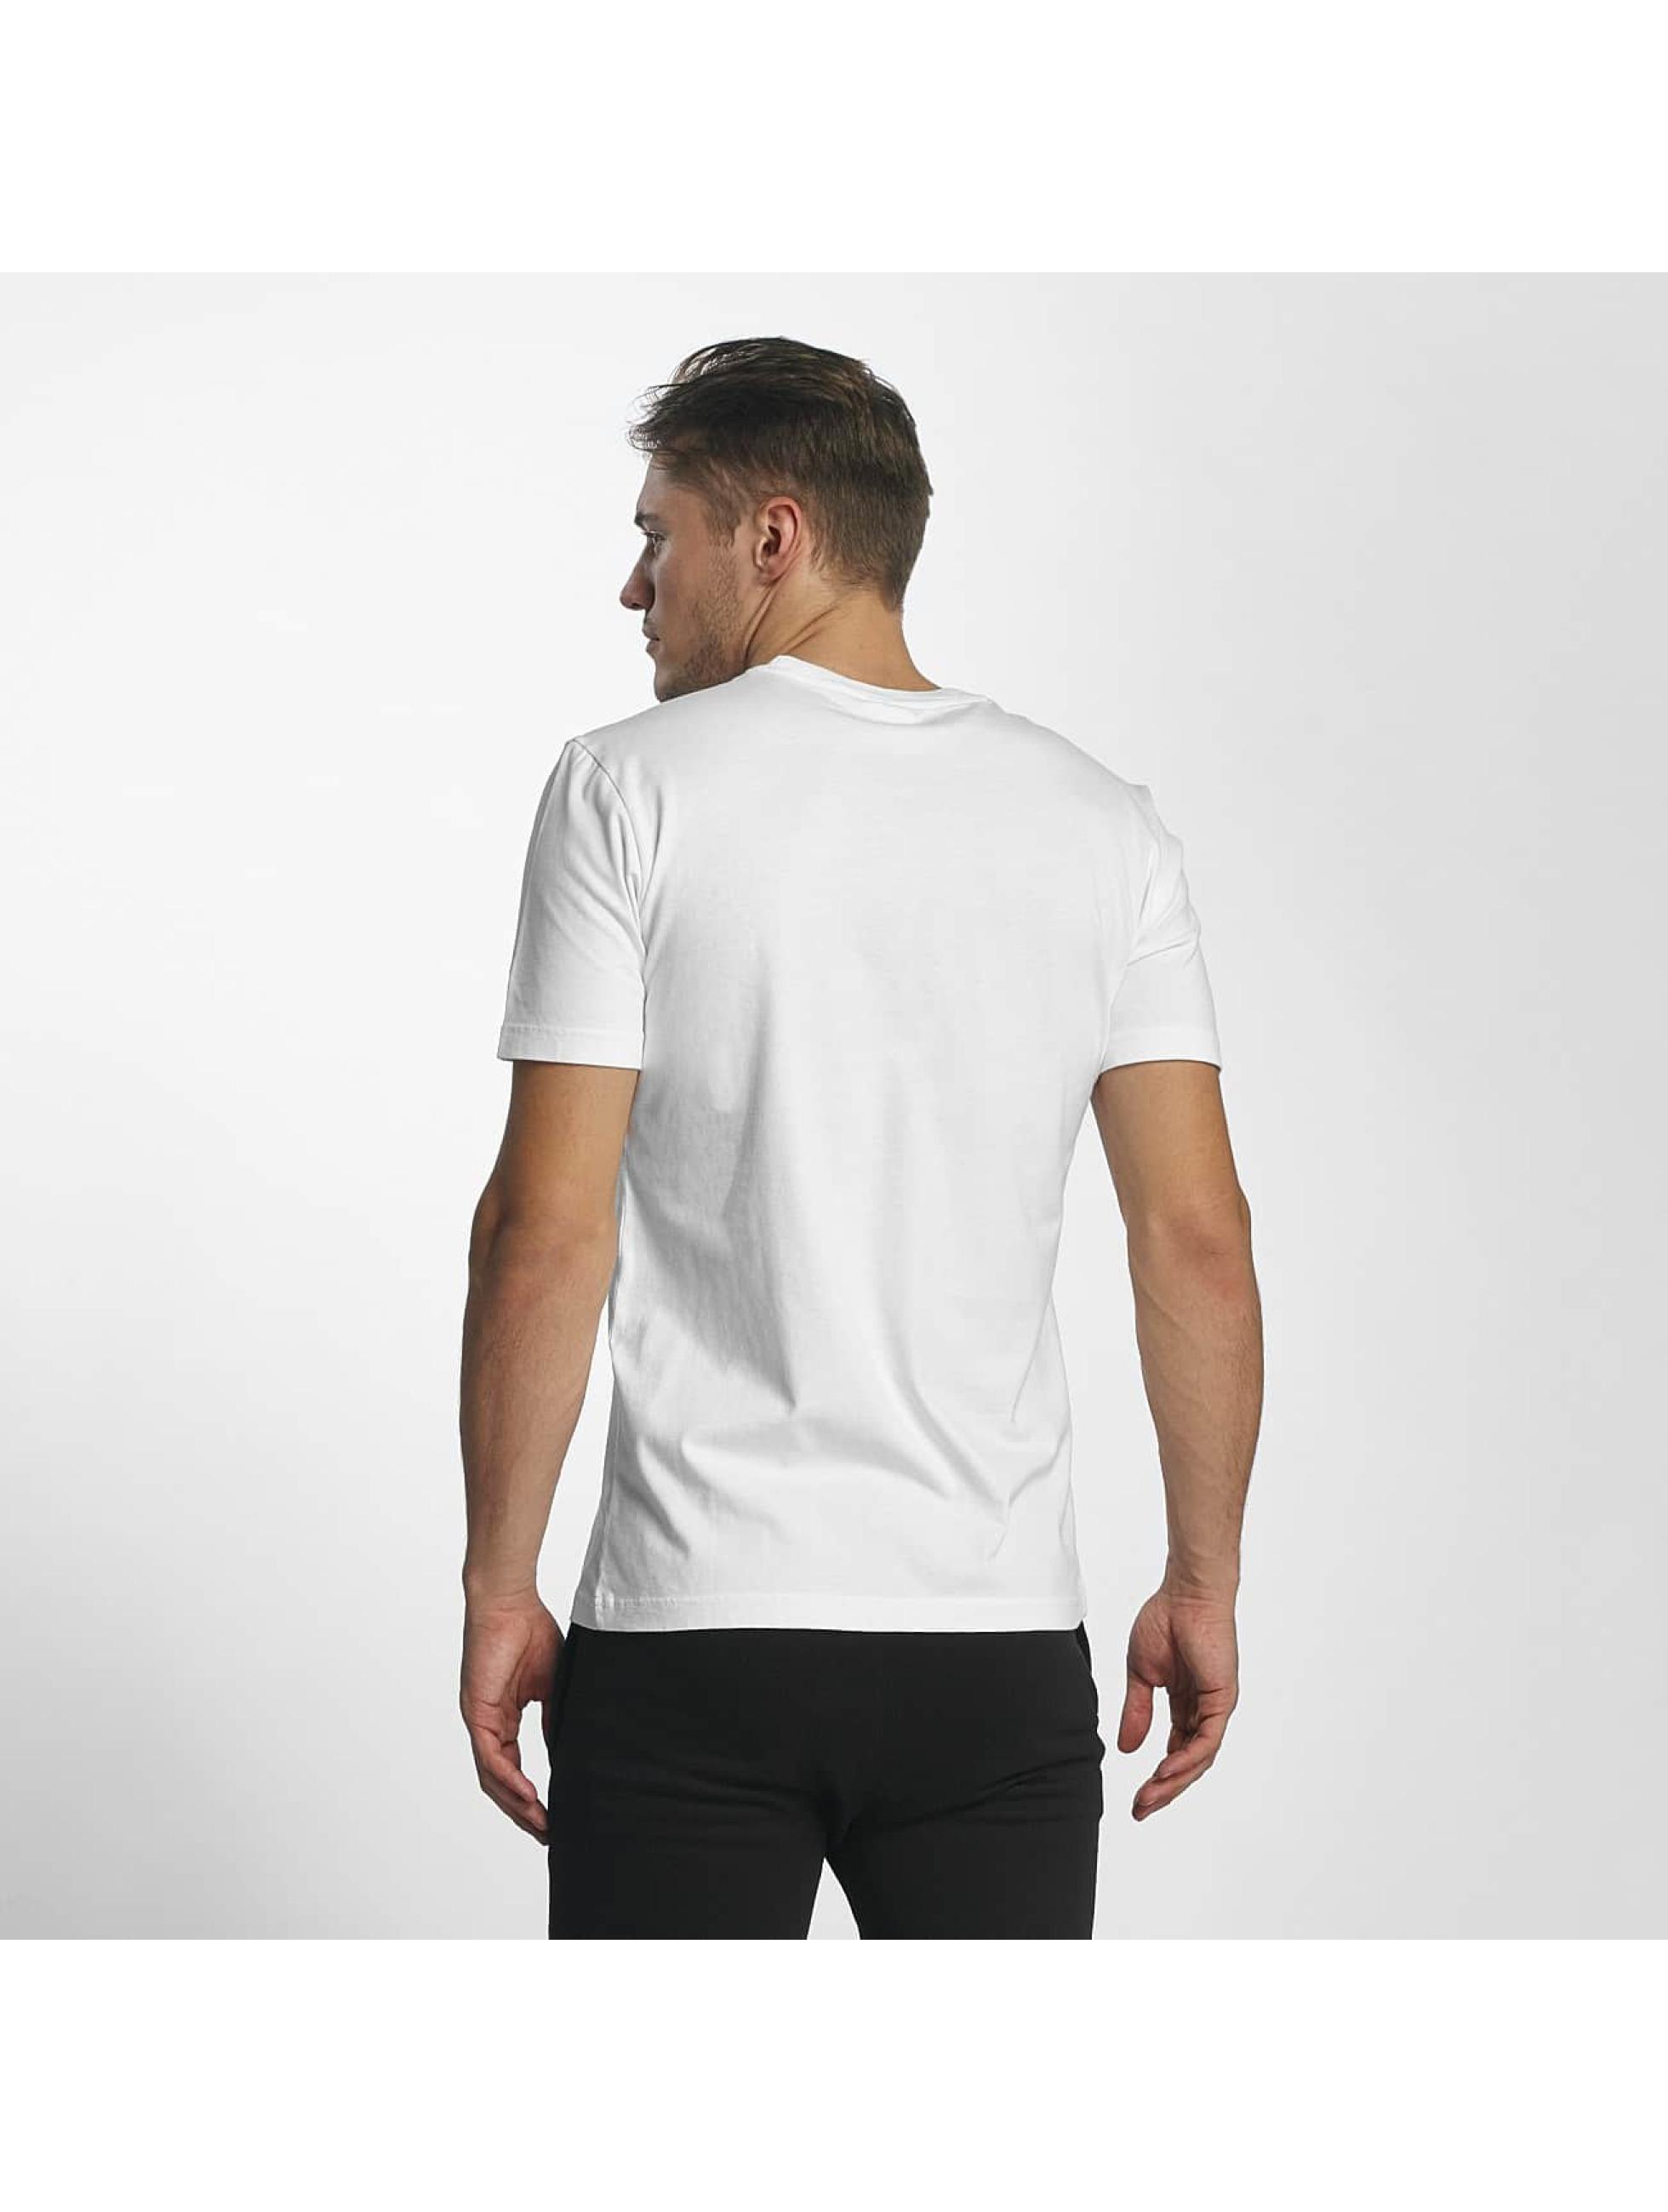 Champion Athletics T-Shirt Rockefeller white